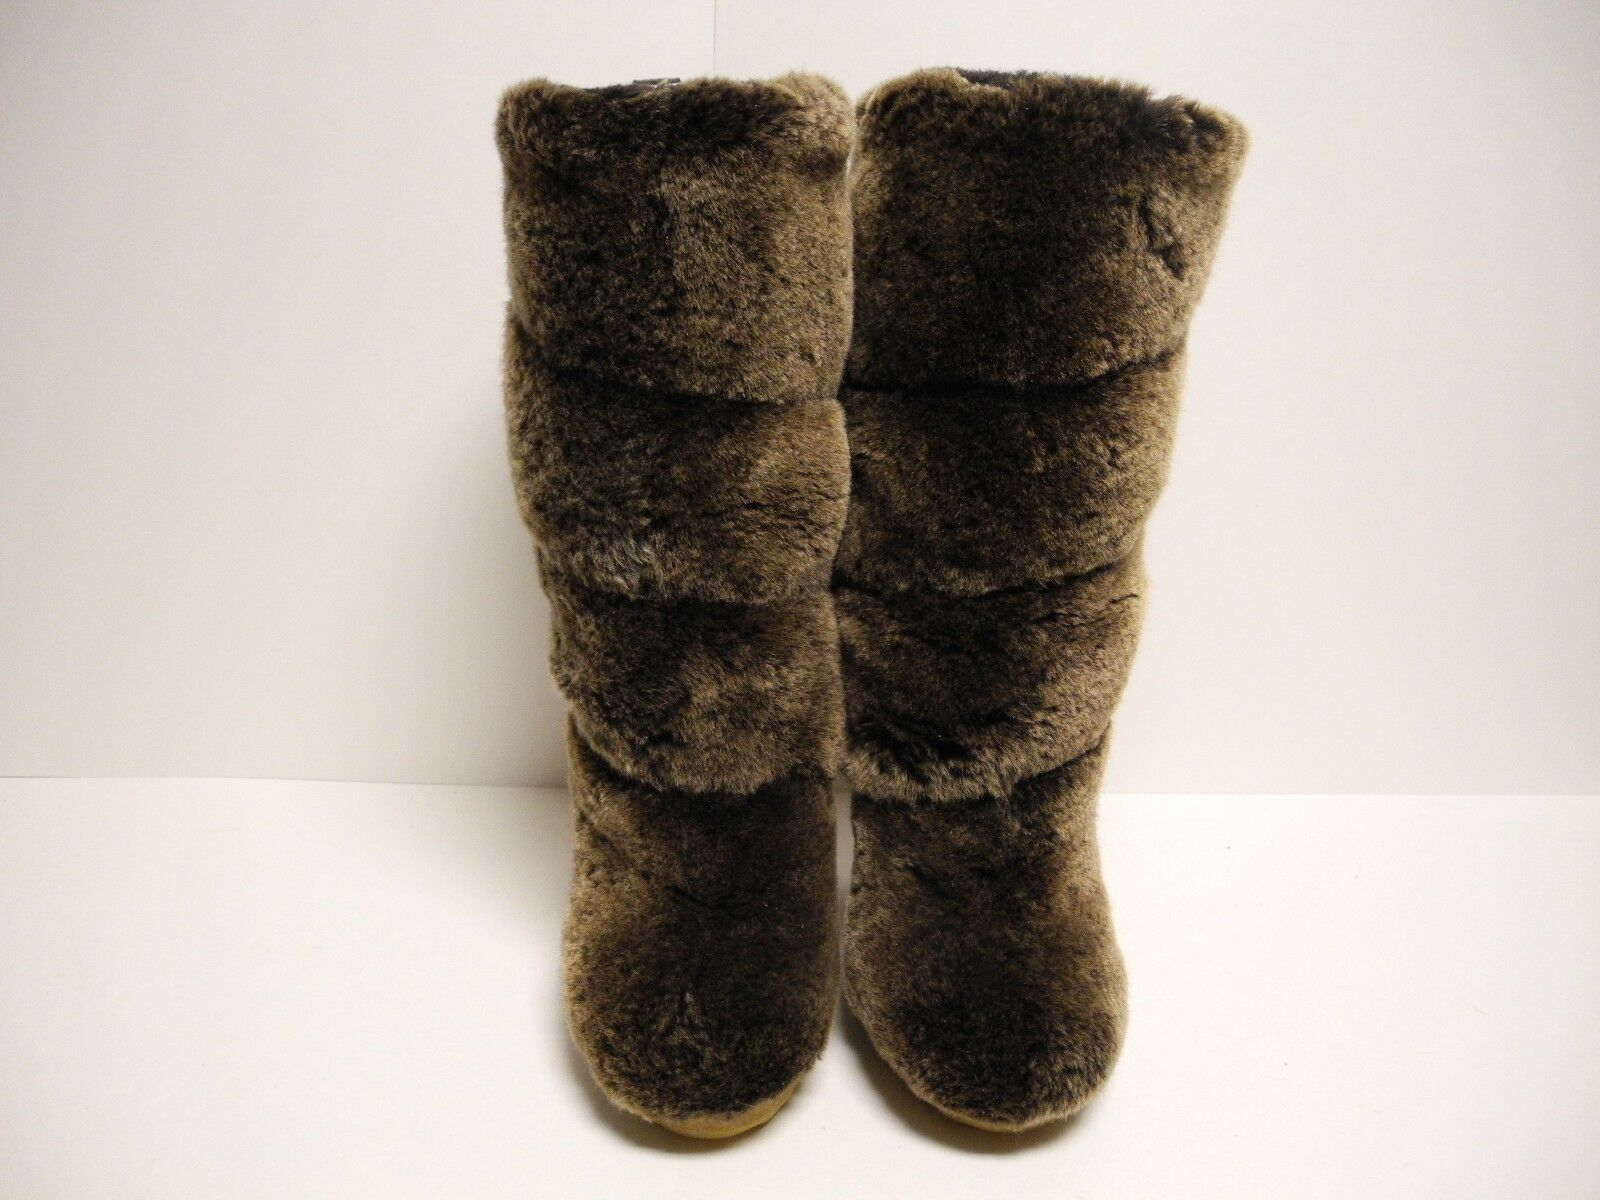 Tory Burch real fur stivali Dimensione 5